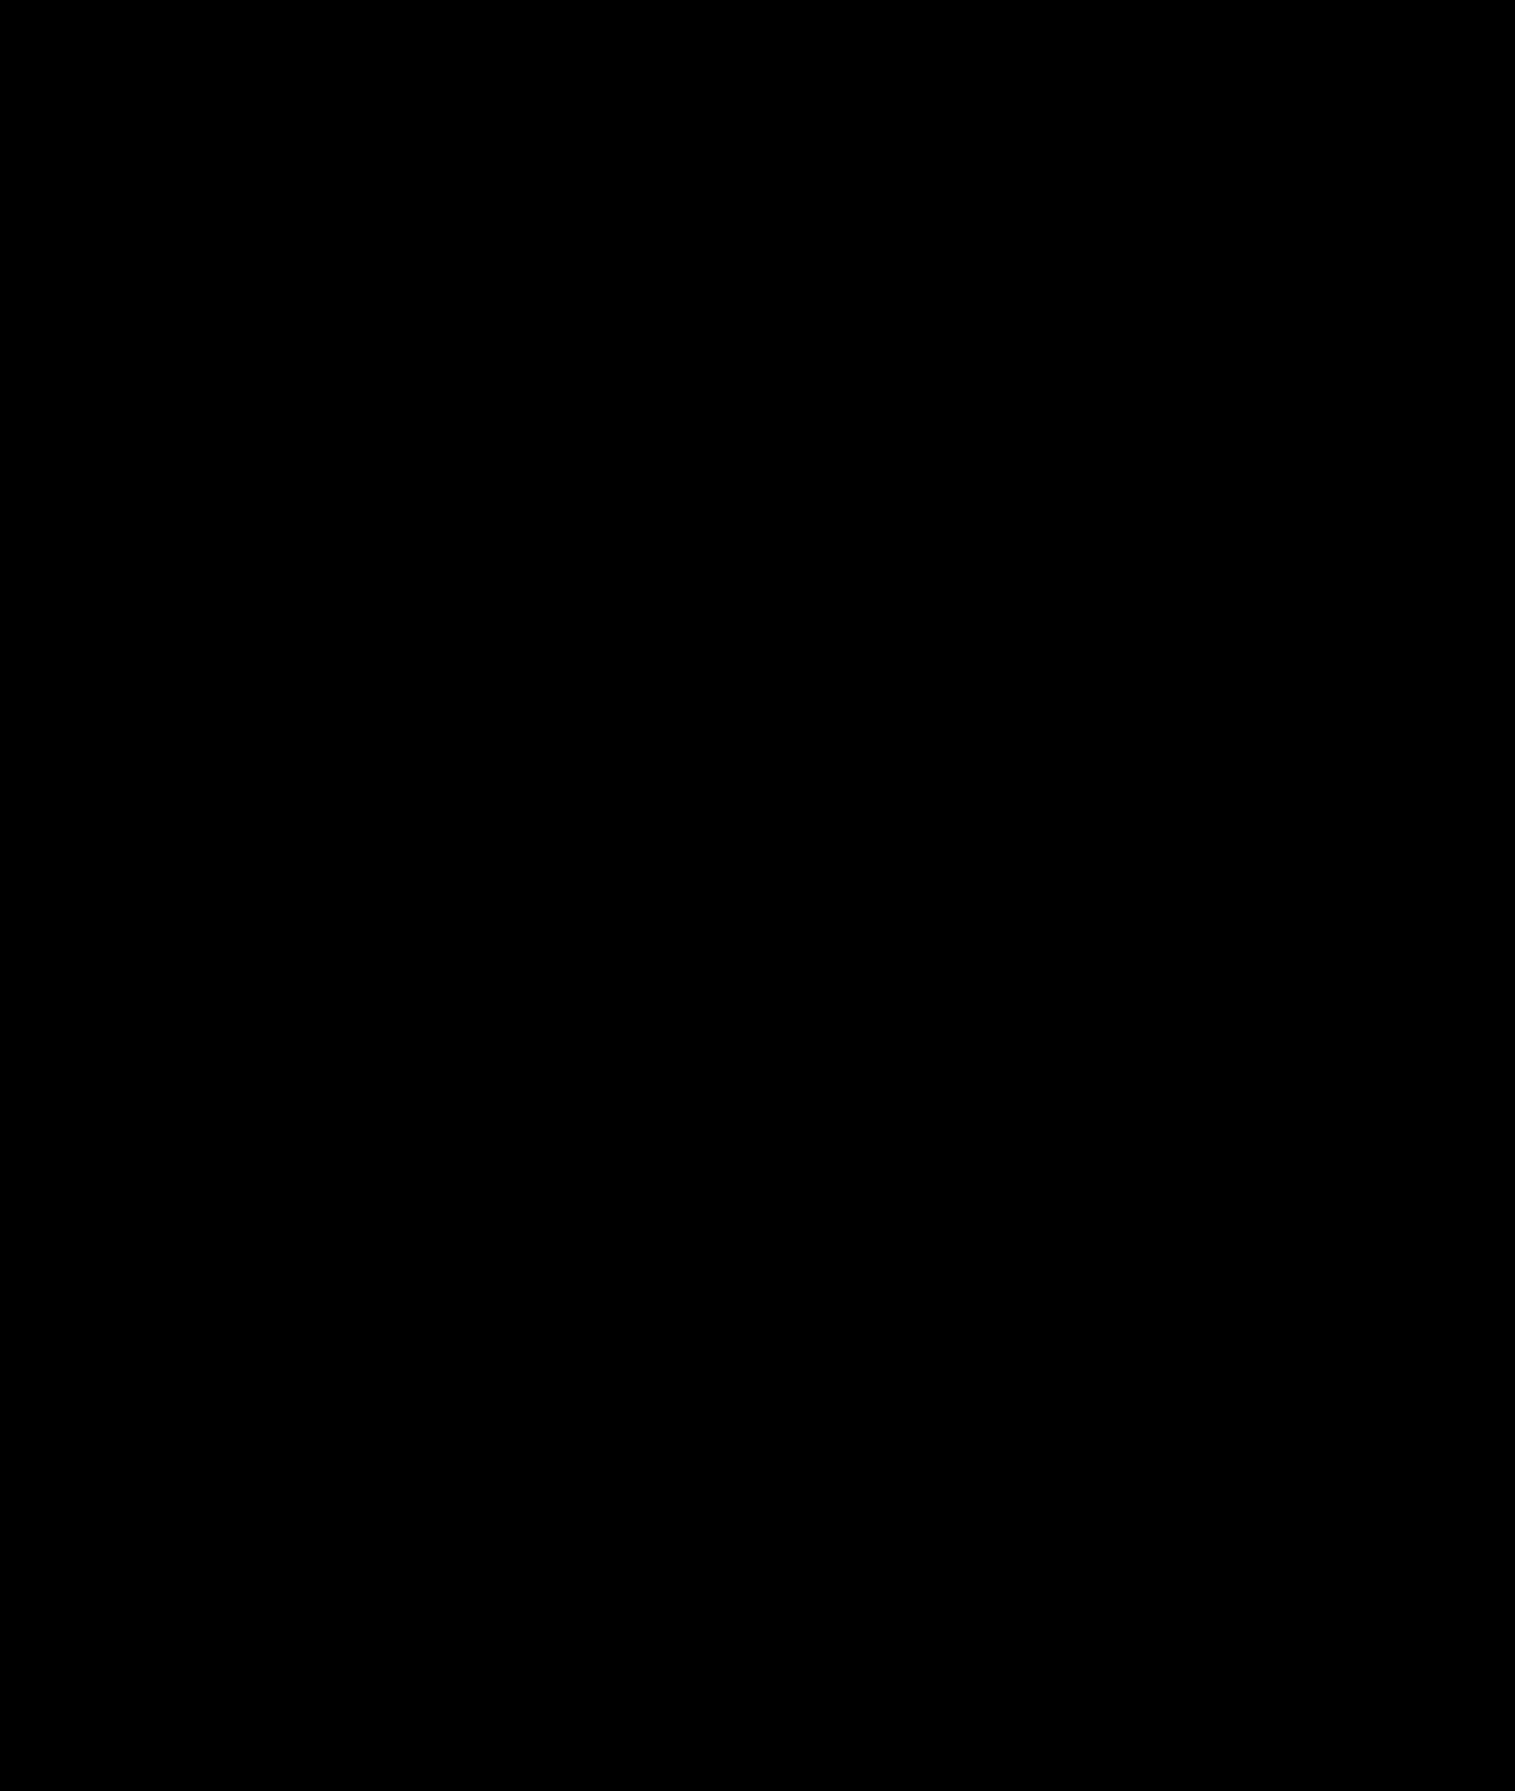 4-Amino-N-[4-(trifluoromethyl)phenyl]benzamide